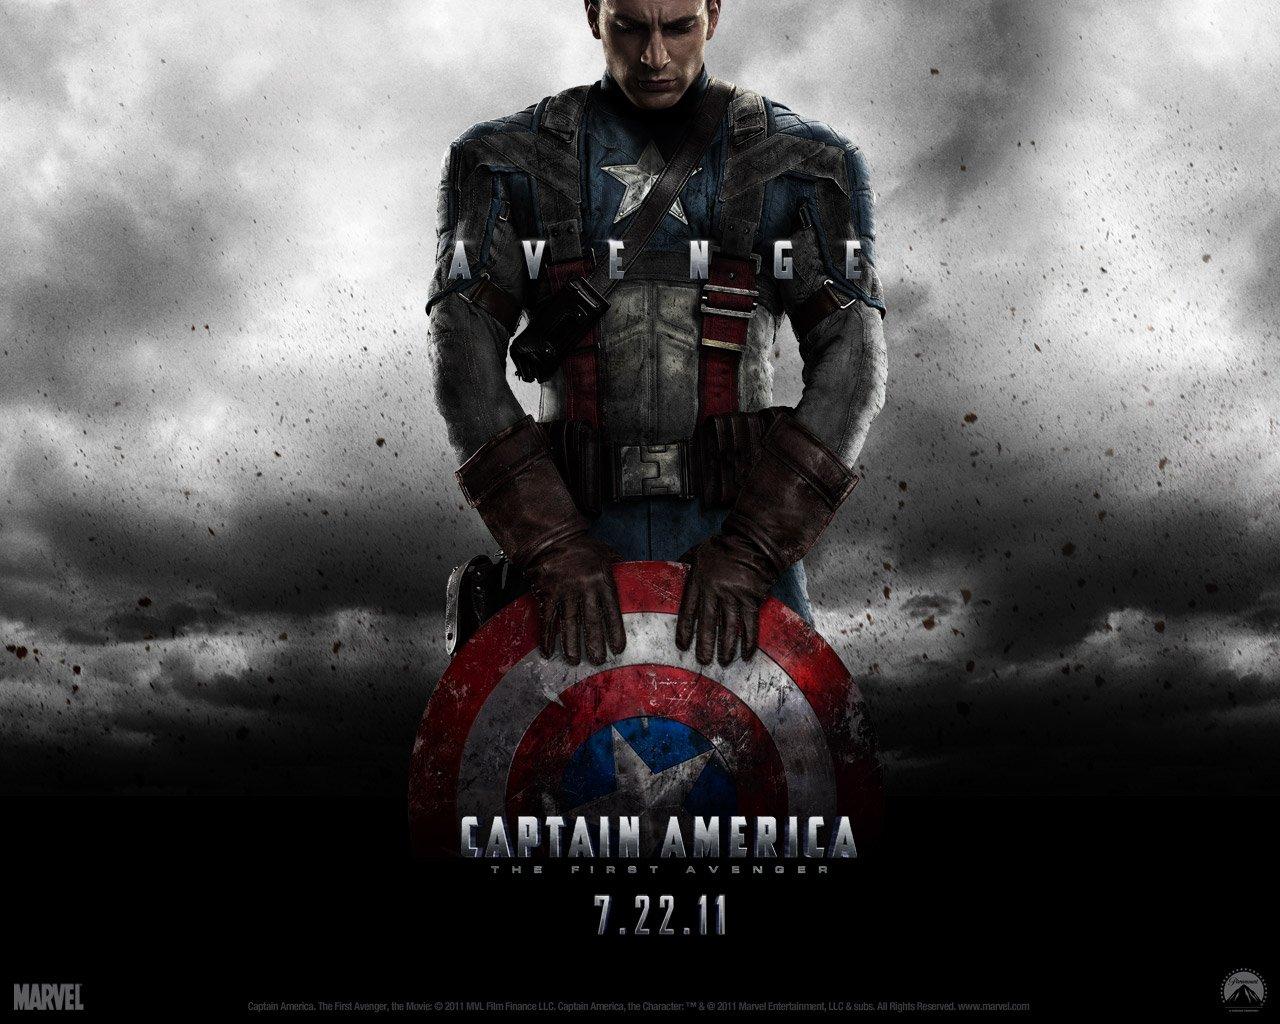 http://1.bp.blogspot.com/-9Jn238Q8H8E/Tc6KSh3uaRI/AAAAAAAAAGs/CgAKJ1irxEs/s1600/Captain+America3.jpg